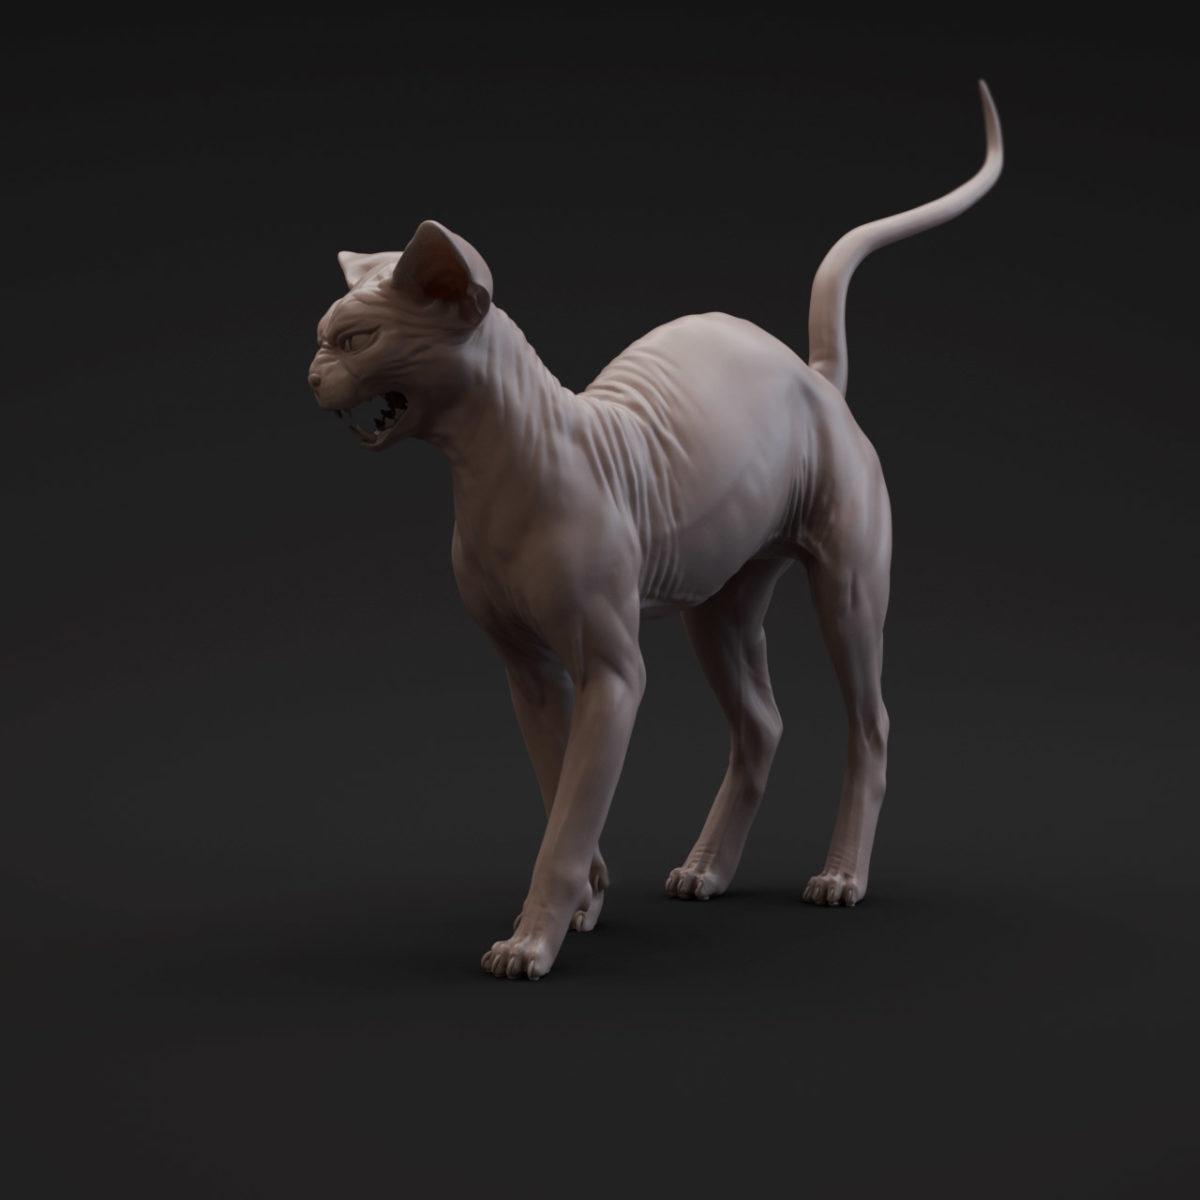 Sphynx Cat ZBrush Model by Digital Artist Anna Schmelzer